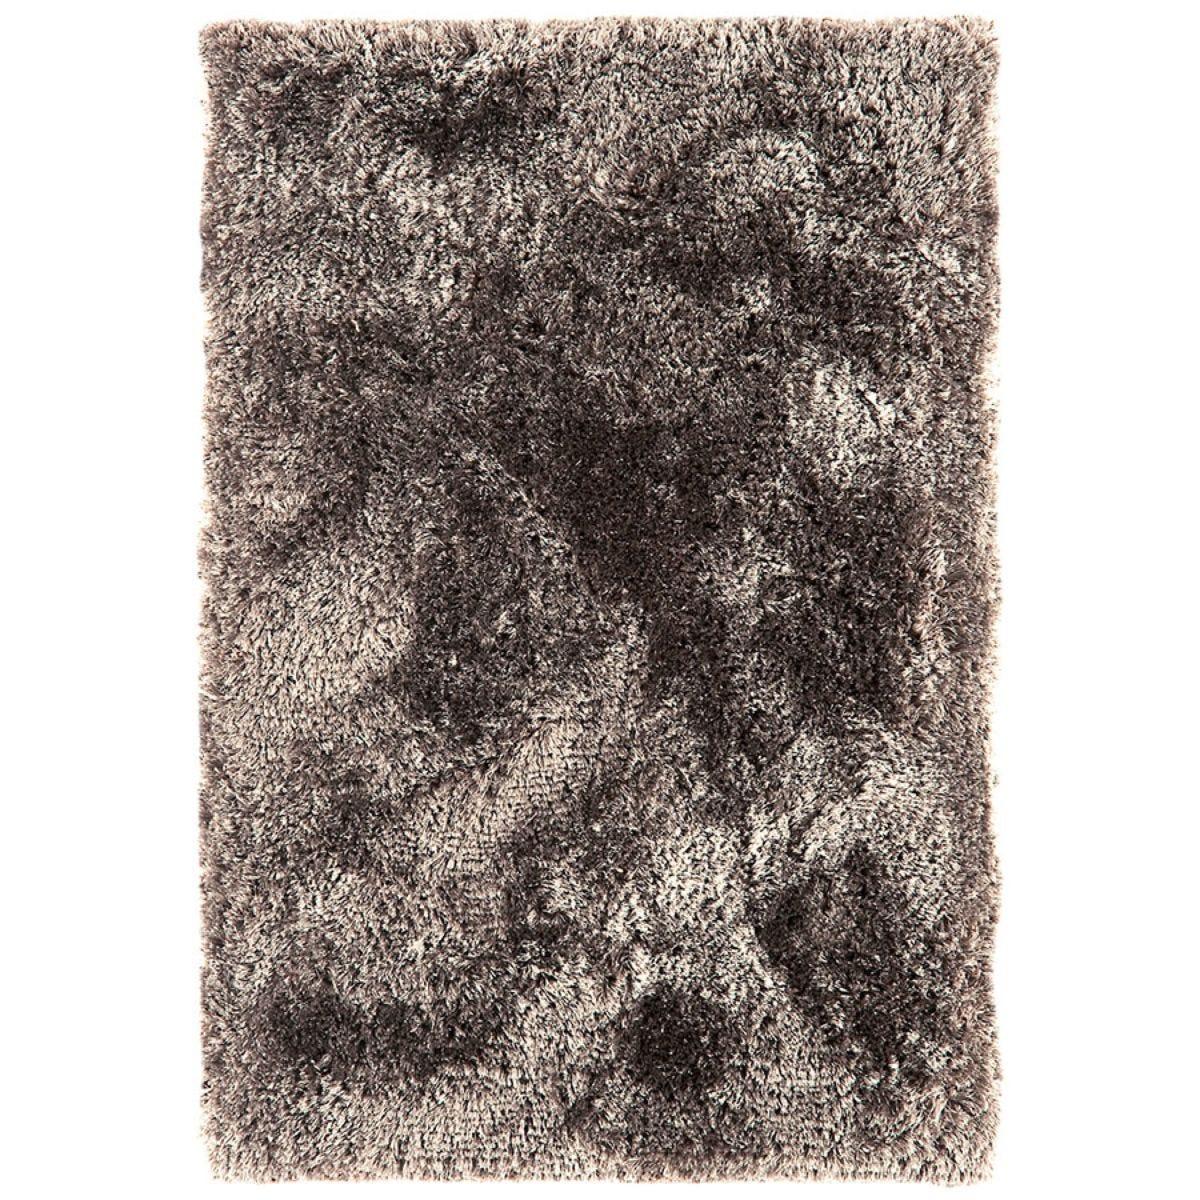 Asiatic Plush Shaggy Rug, 140 x 200cm - Zinc